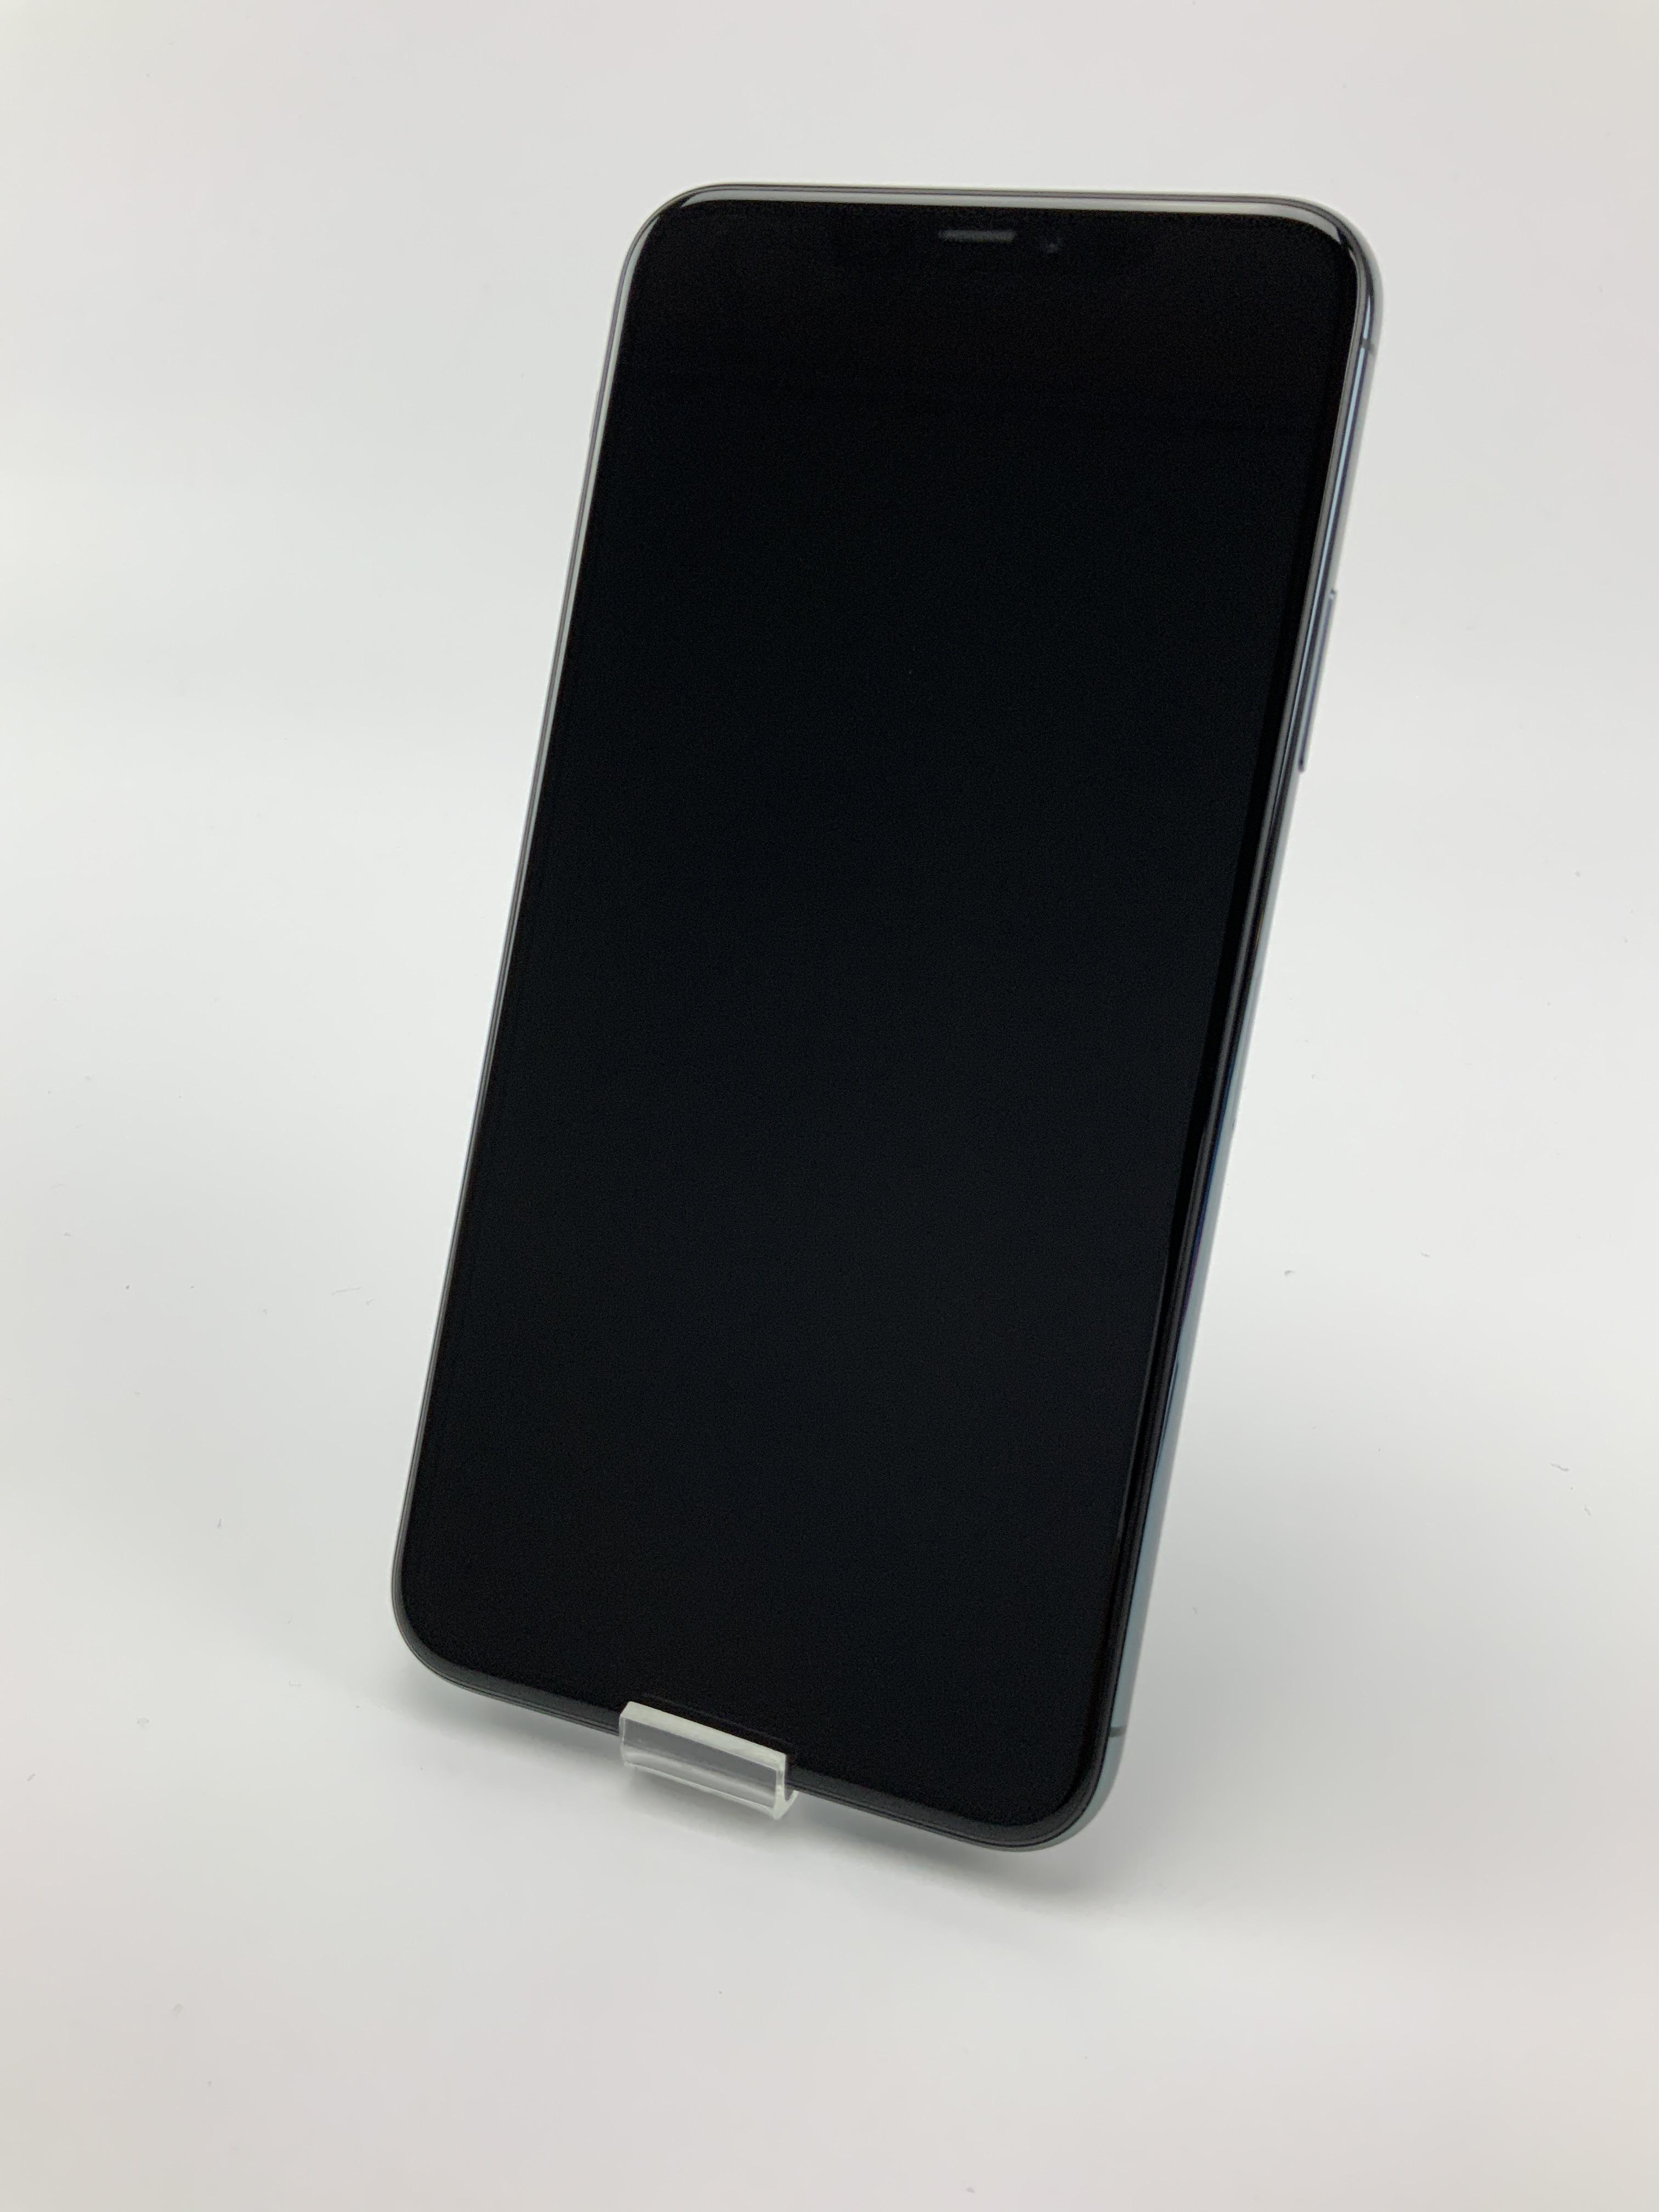 iPhone 11 Pro Max 256GB, 256GB, Midnight Green, imagen 1